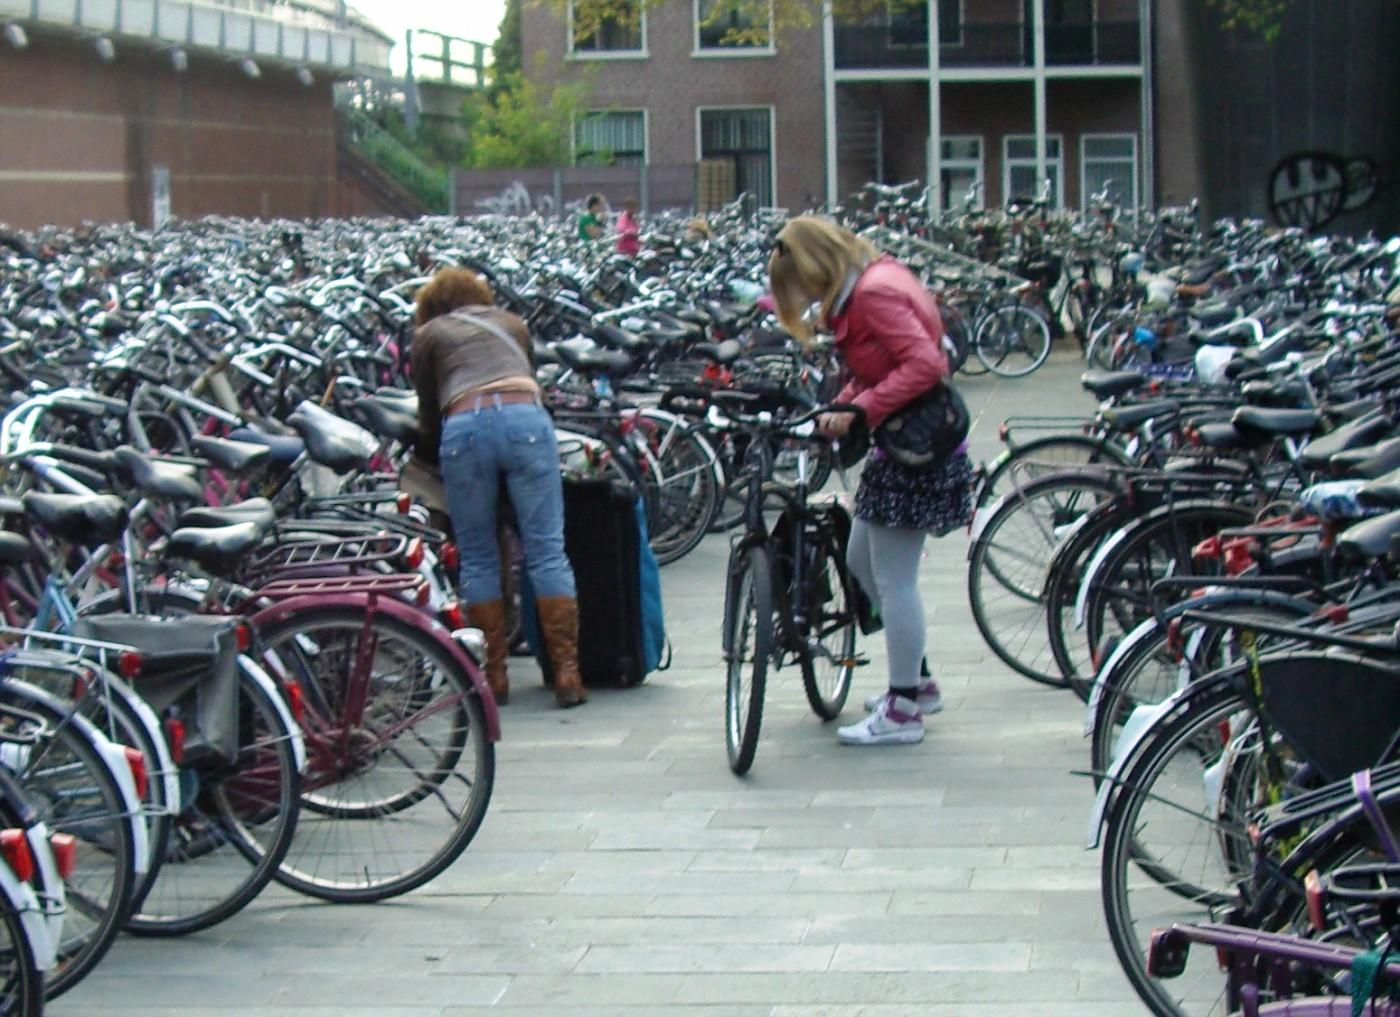 Fietsenstalling in Haarlem